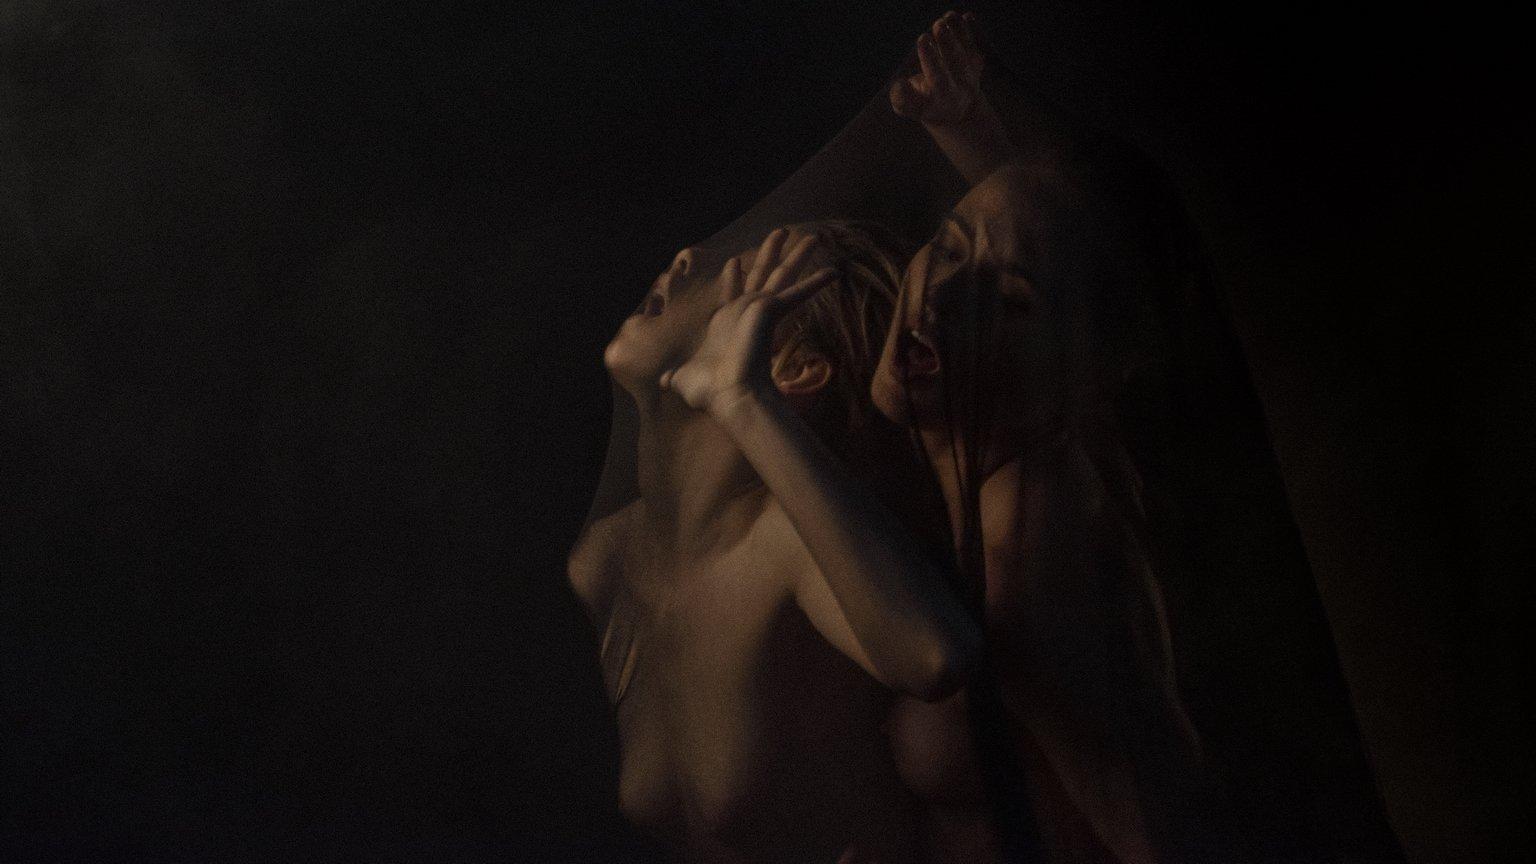 alexandrucrisan,fineart,photography,dark,dream,memento,memories,lust,human,stories,erotic,nude,darkness,woman,body,artphotography,limitededition,anxiety,film,madhouse,erotica,dirtythings,whispermeawish,asylum,dreams,love,erotikon,wish,whisper,desire,geome, Crisan Alexandru